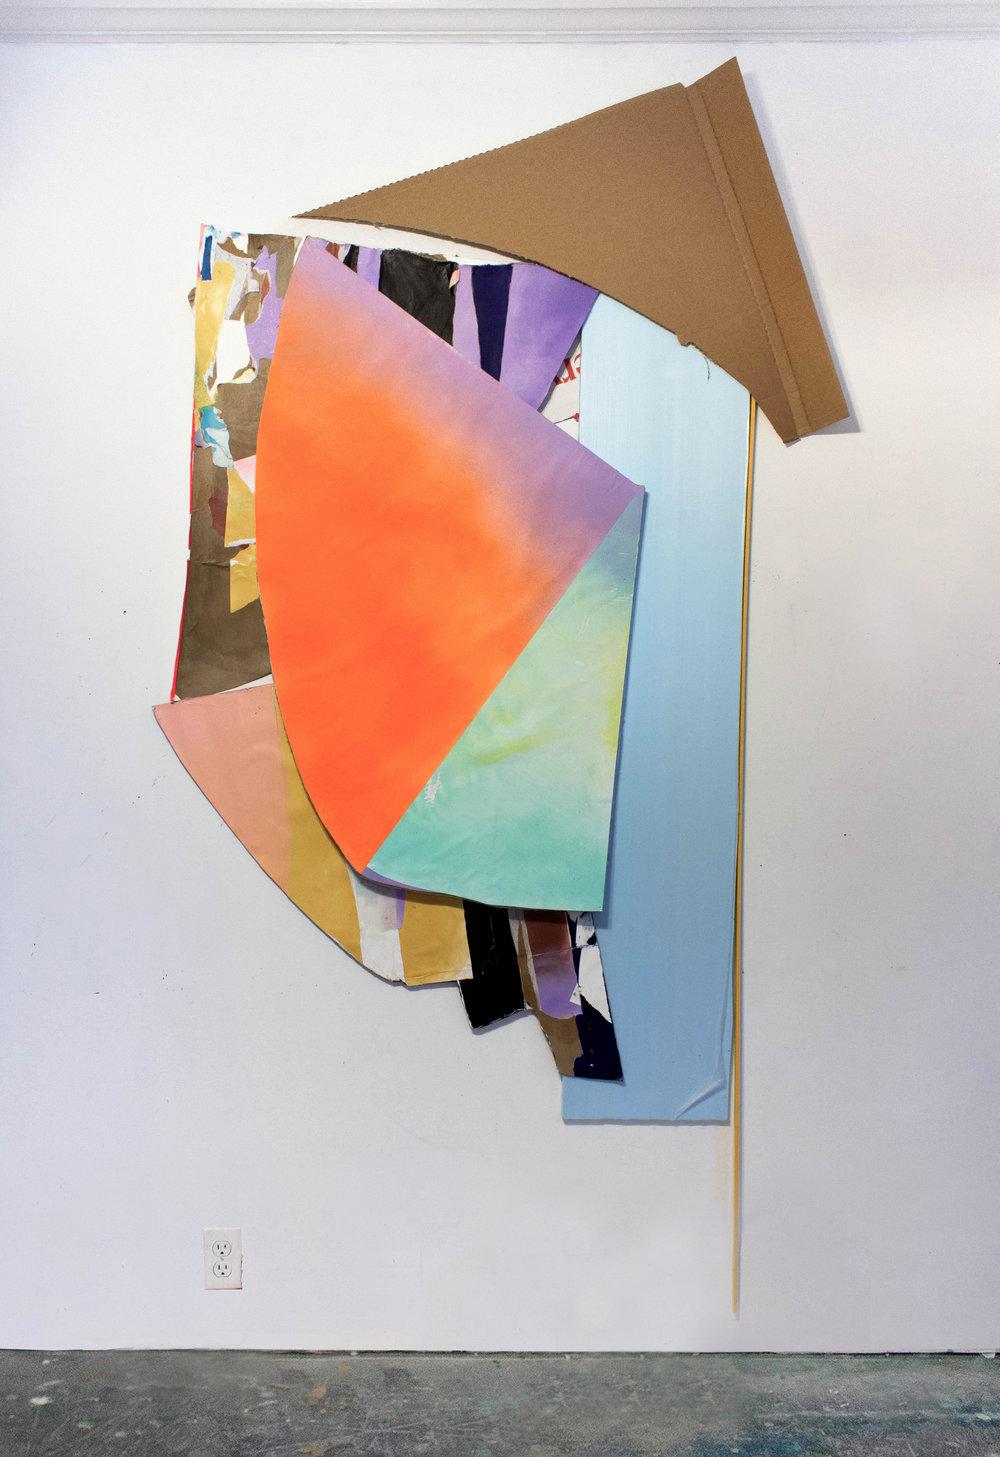 "Towards the Corner, 86""x43""x7"", Styrofoam, Cardboard, Spray Paint, Collage, Wood, 2018"